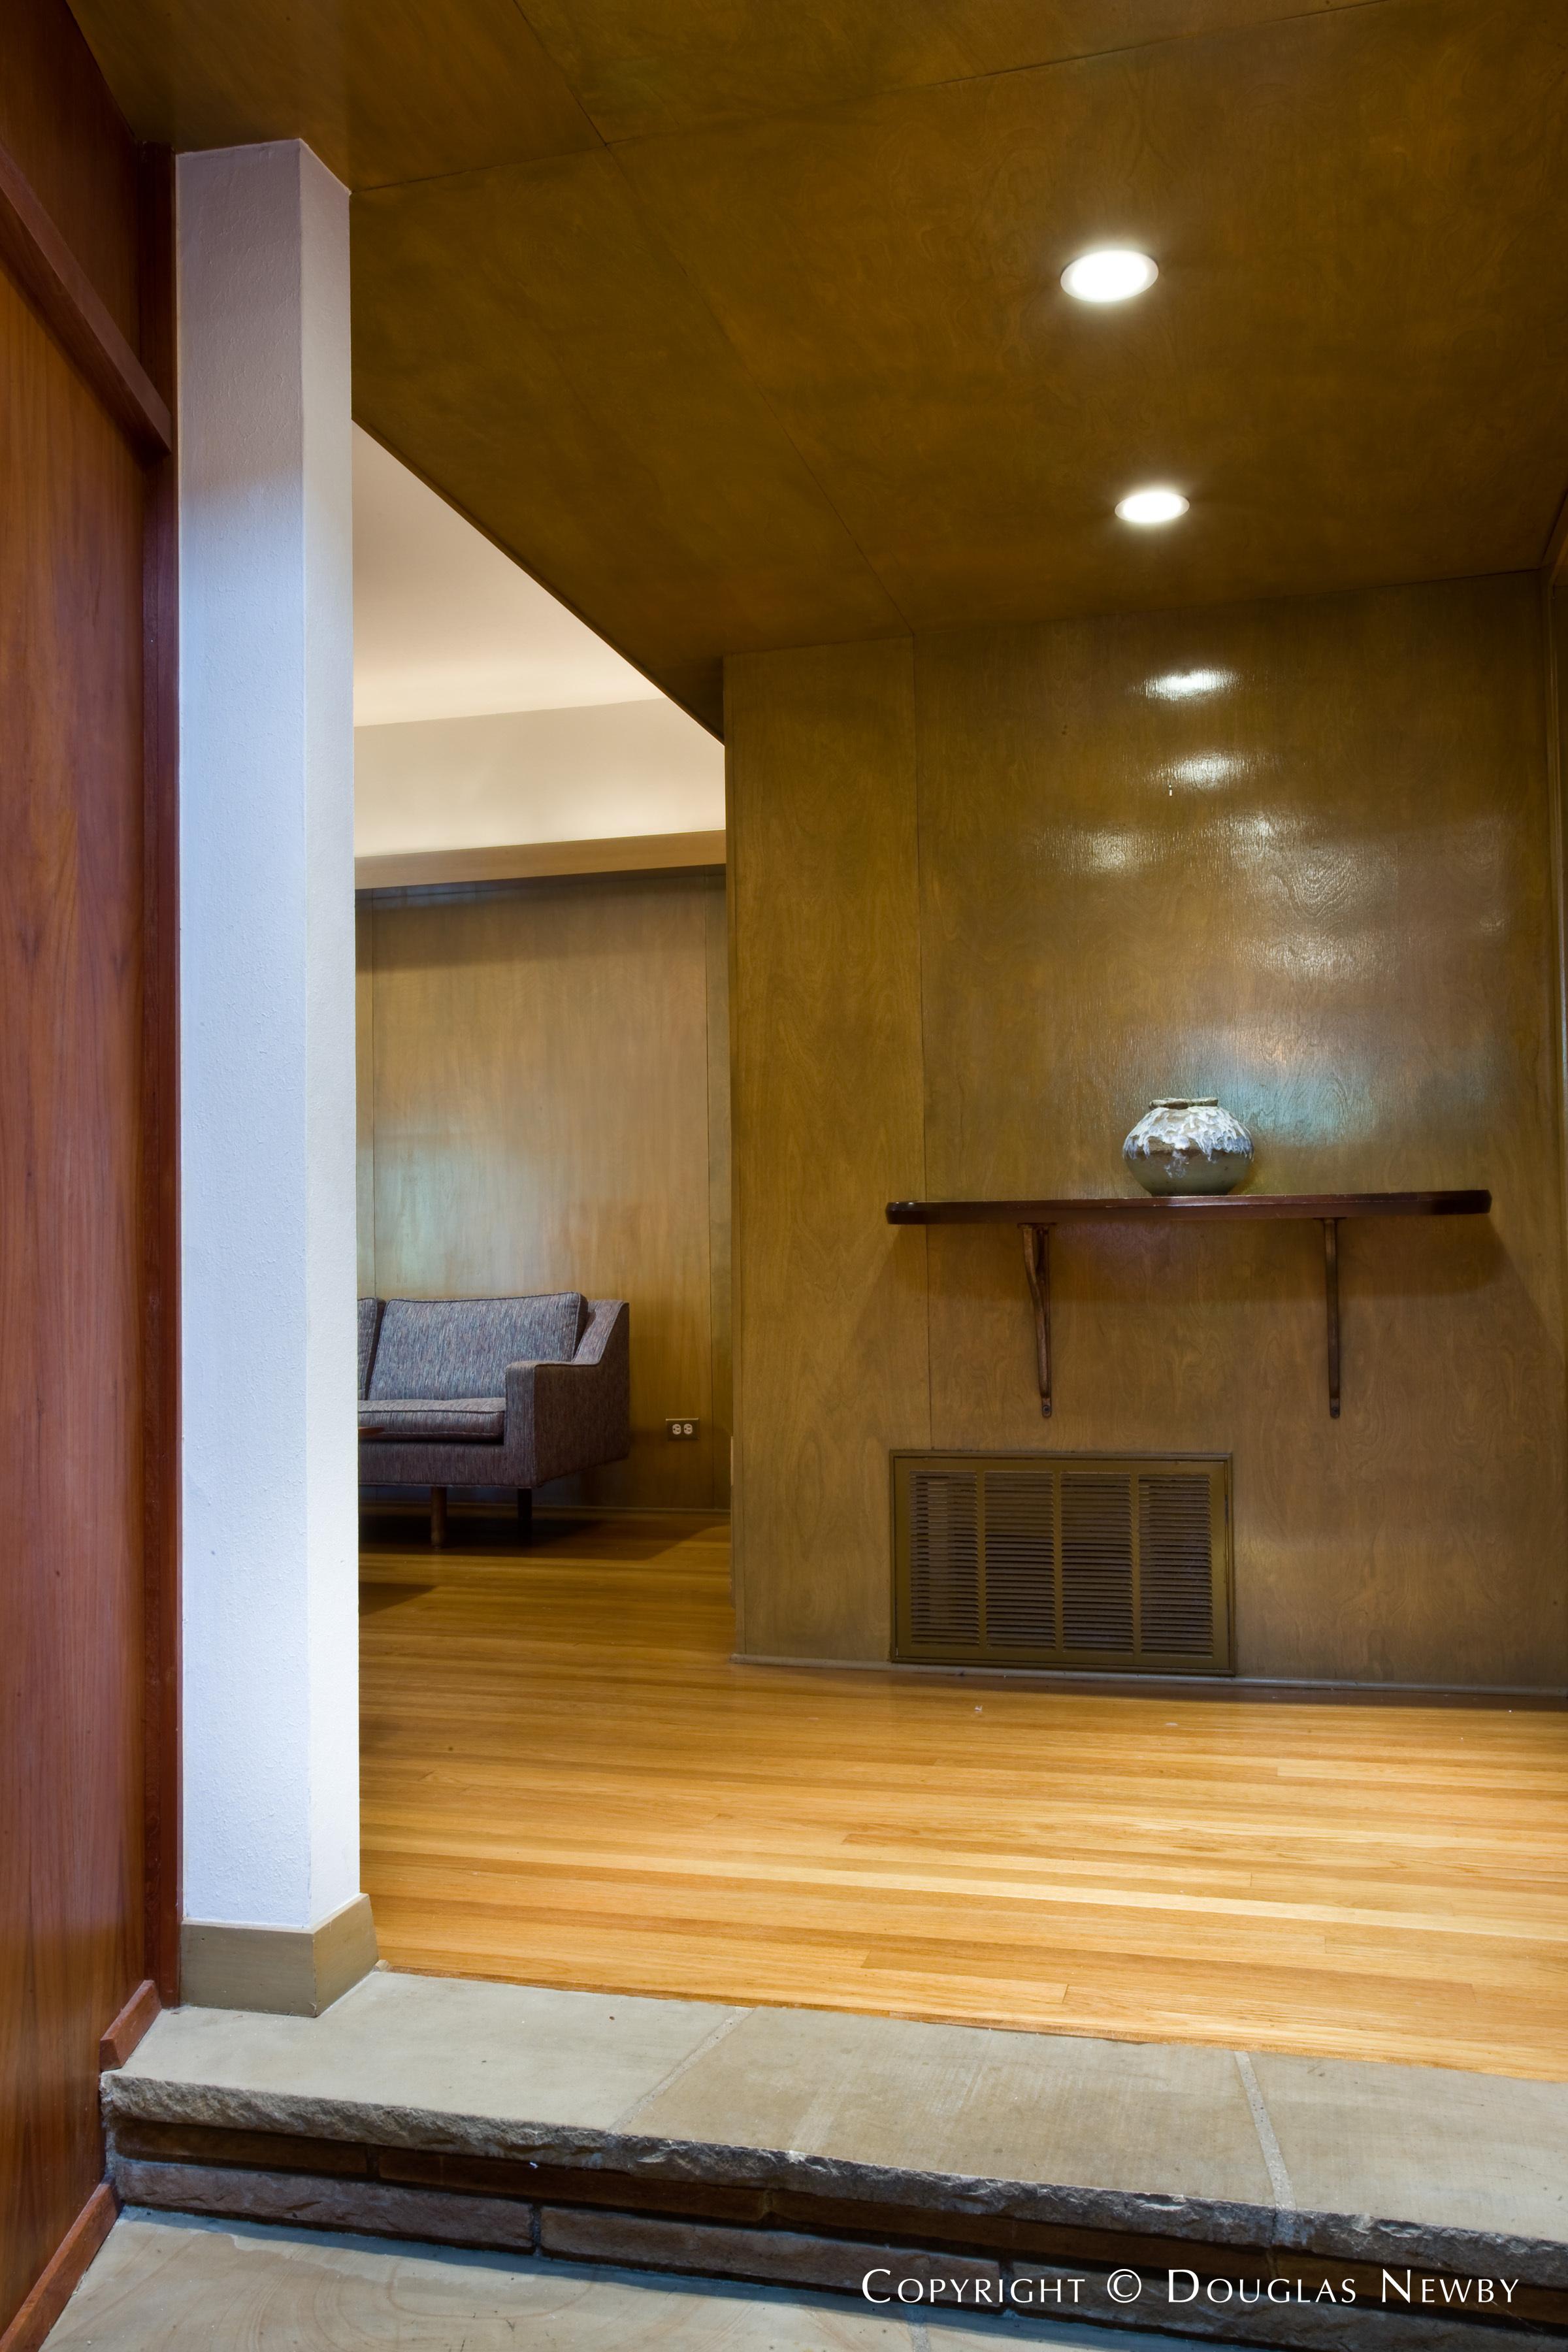 University Park Mid-Century Modern Real Estate on 0.258 Acres